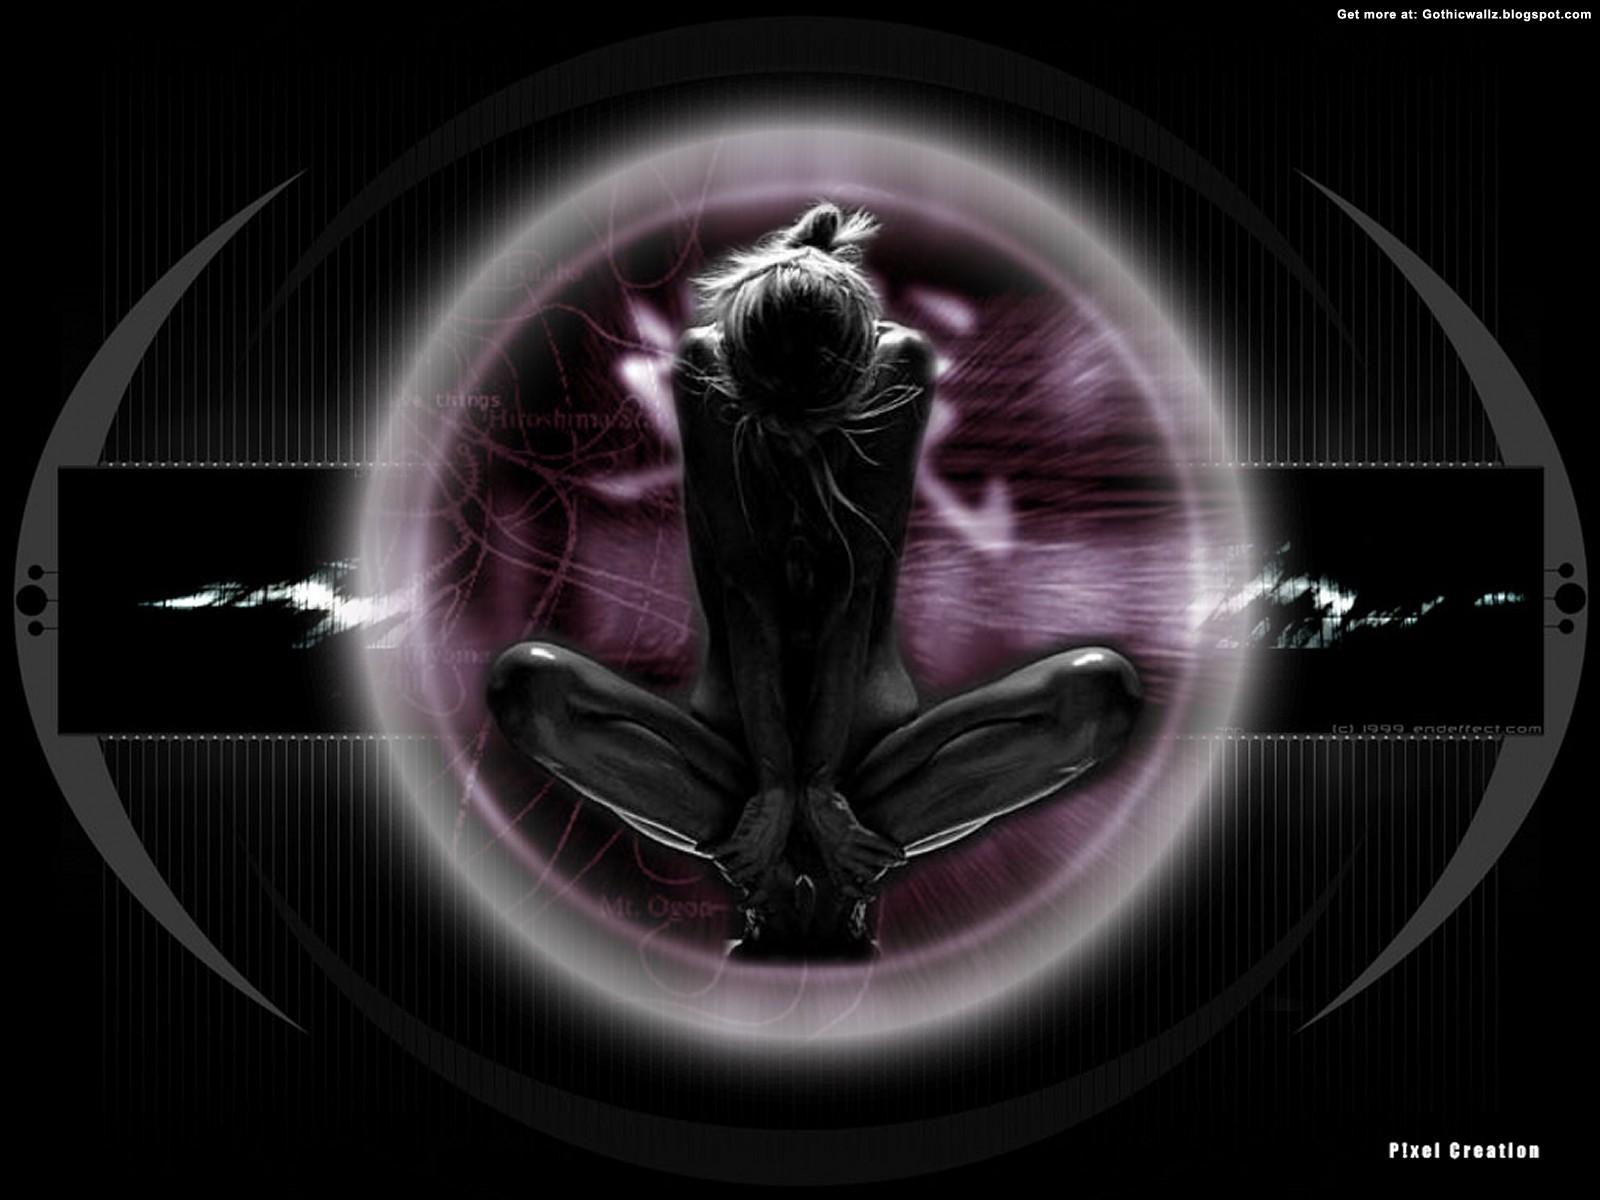 http://3.bp.blogspot.com/-ykKK17Wb0yc/UWwuNdLKFsI/AAAAAAAAMuE/vivGyZSXi1s/s1600/Scary+Wallpaper+-+Gothic+Wallpaper+Compilation+2013+-+4.jpg